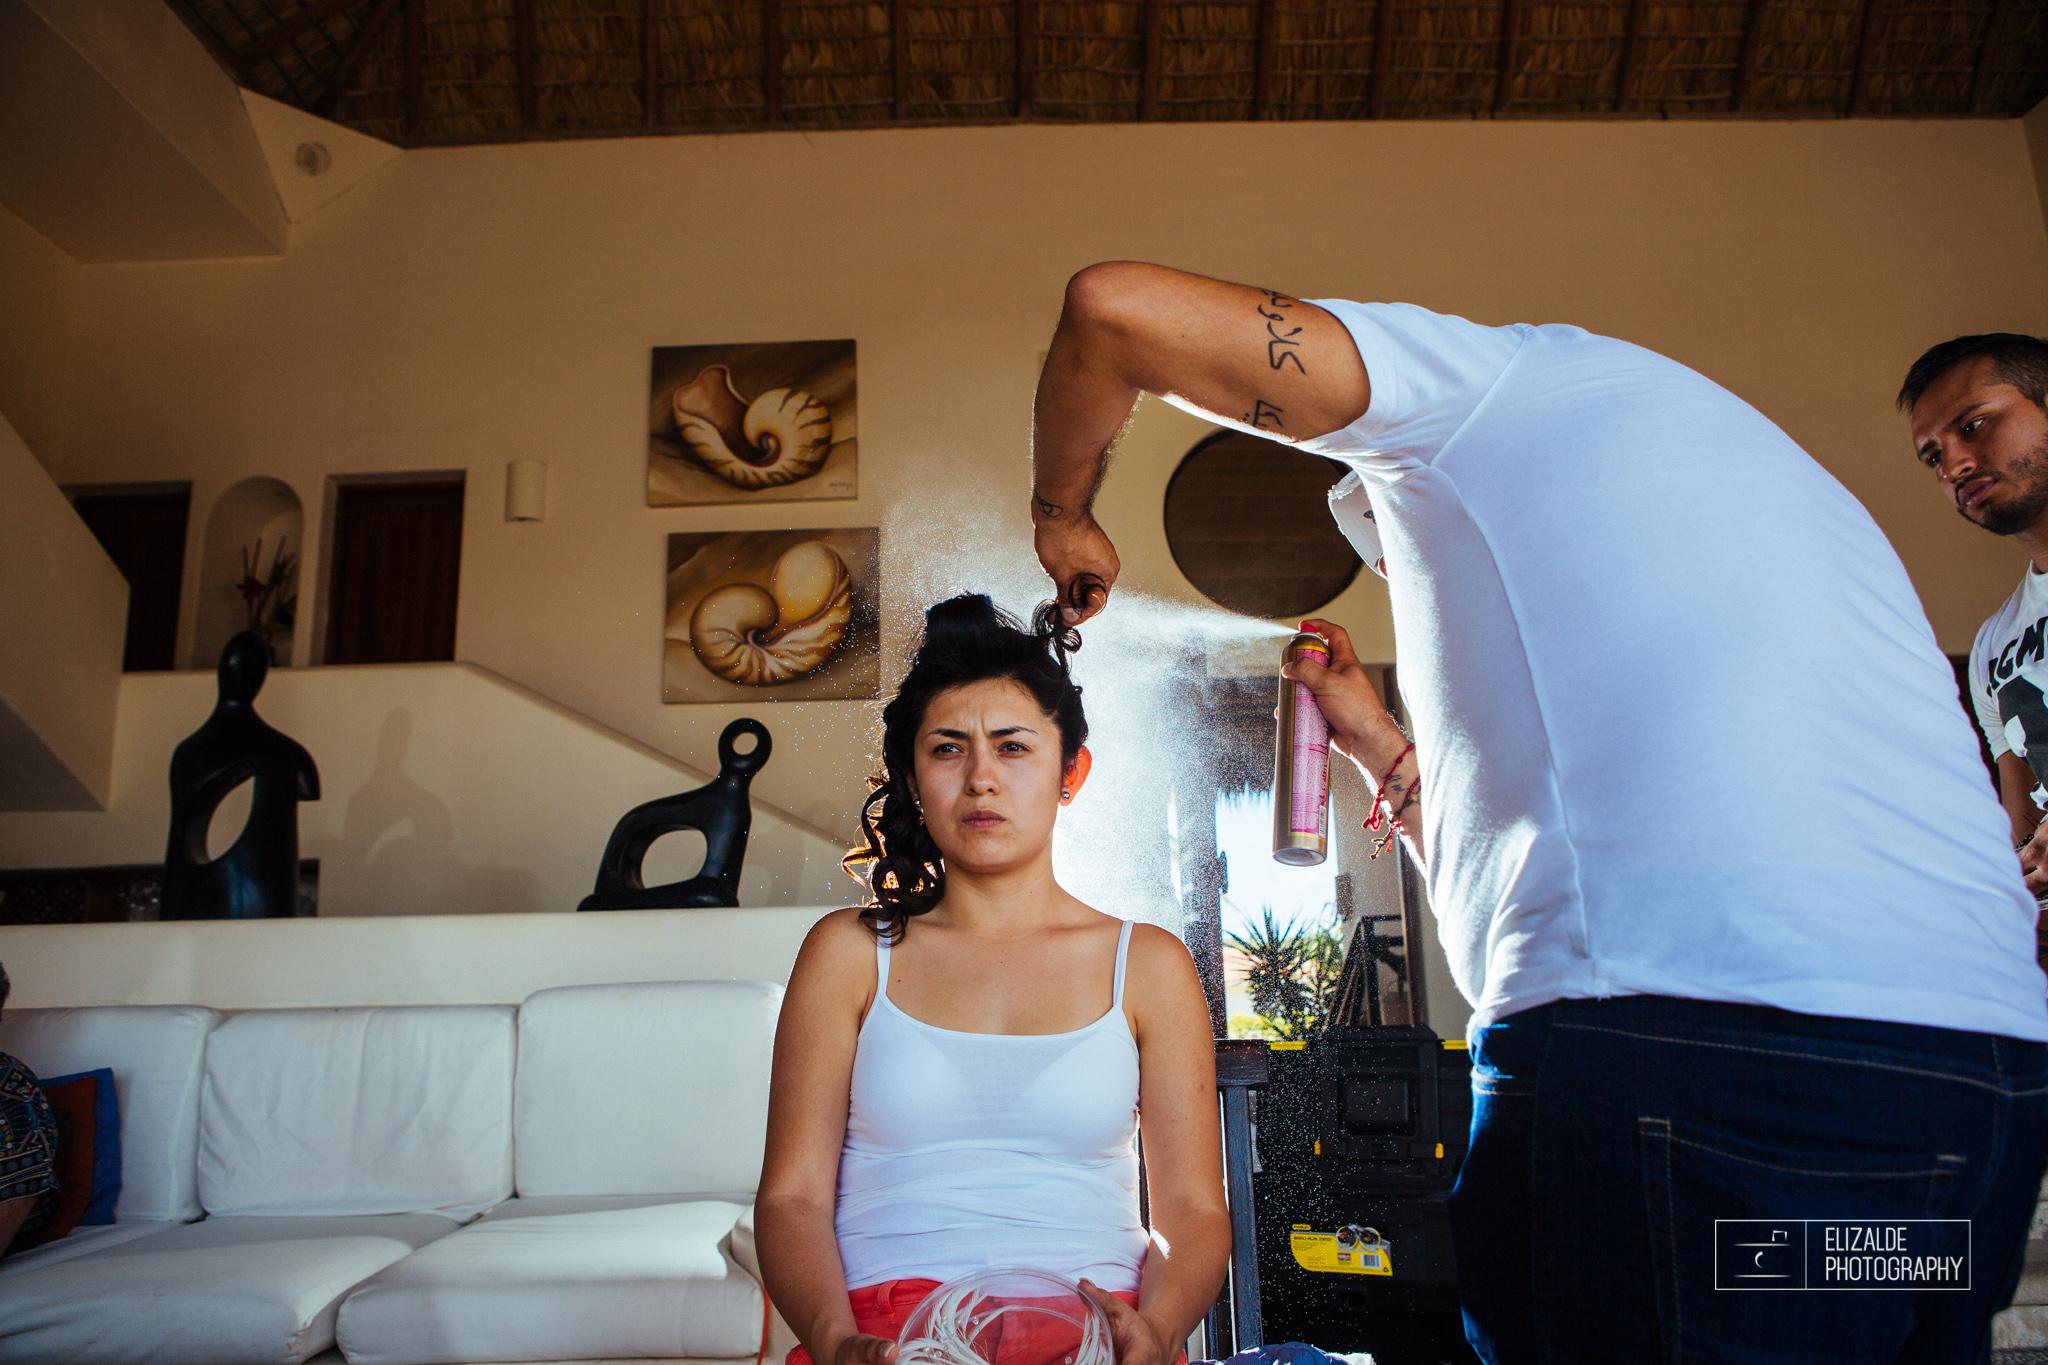 Pay and Ferran_Acapulco_Destination Wedding_Elizalde Photography-14.jpg